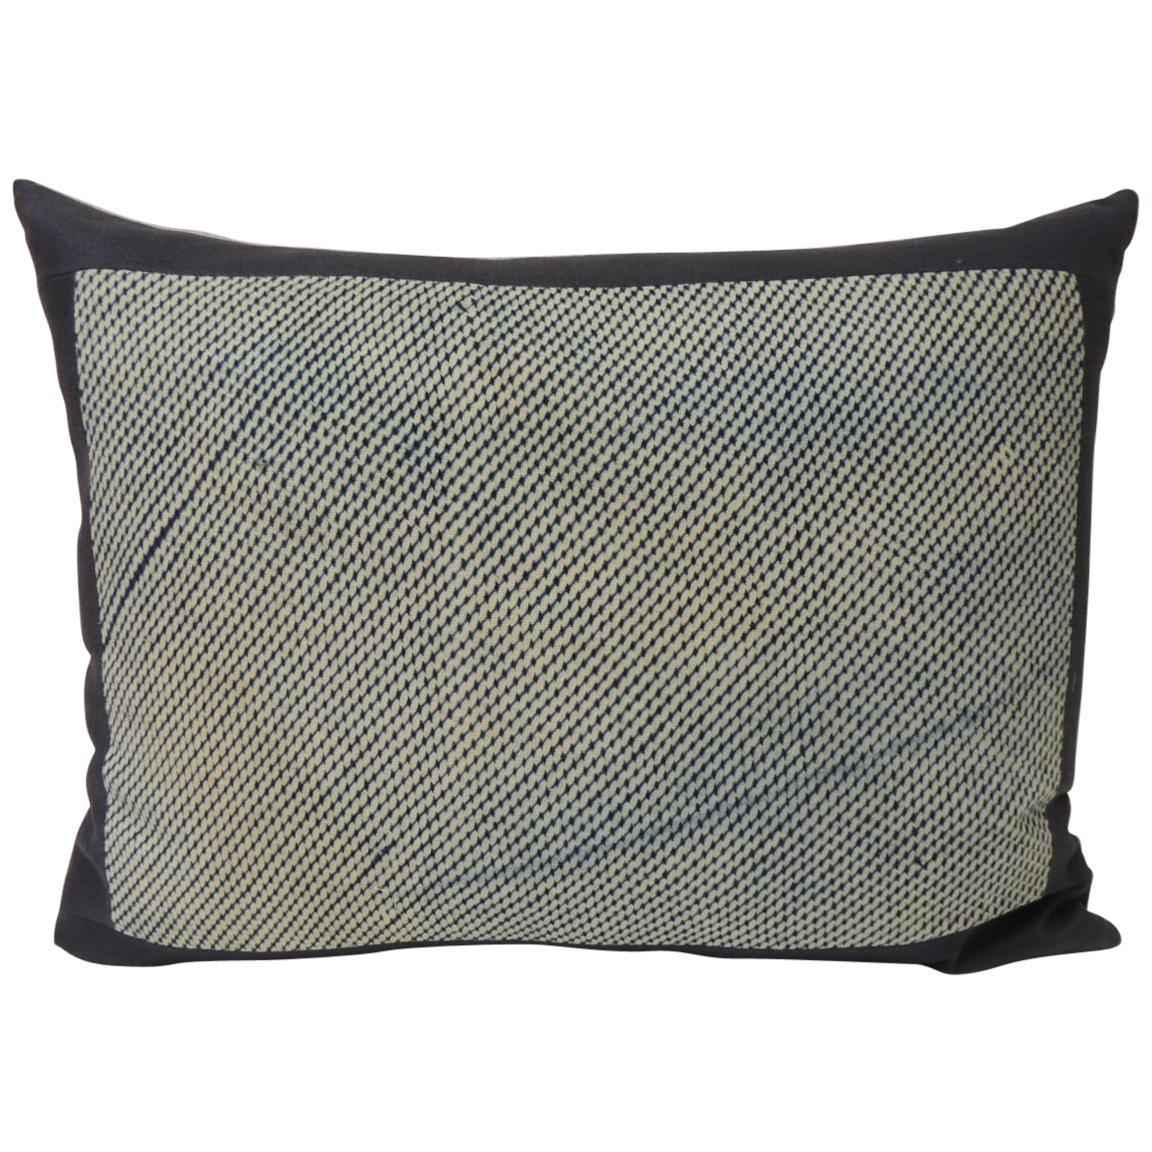 Vintage Shibori Asian Blue and White Decorative Bolster Pillow